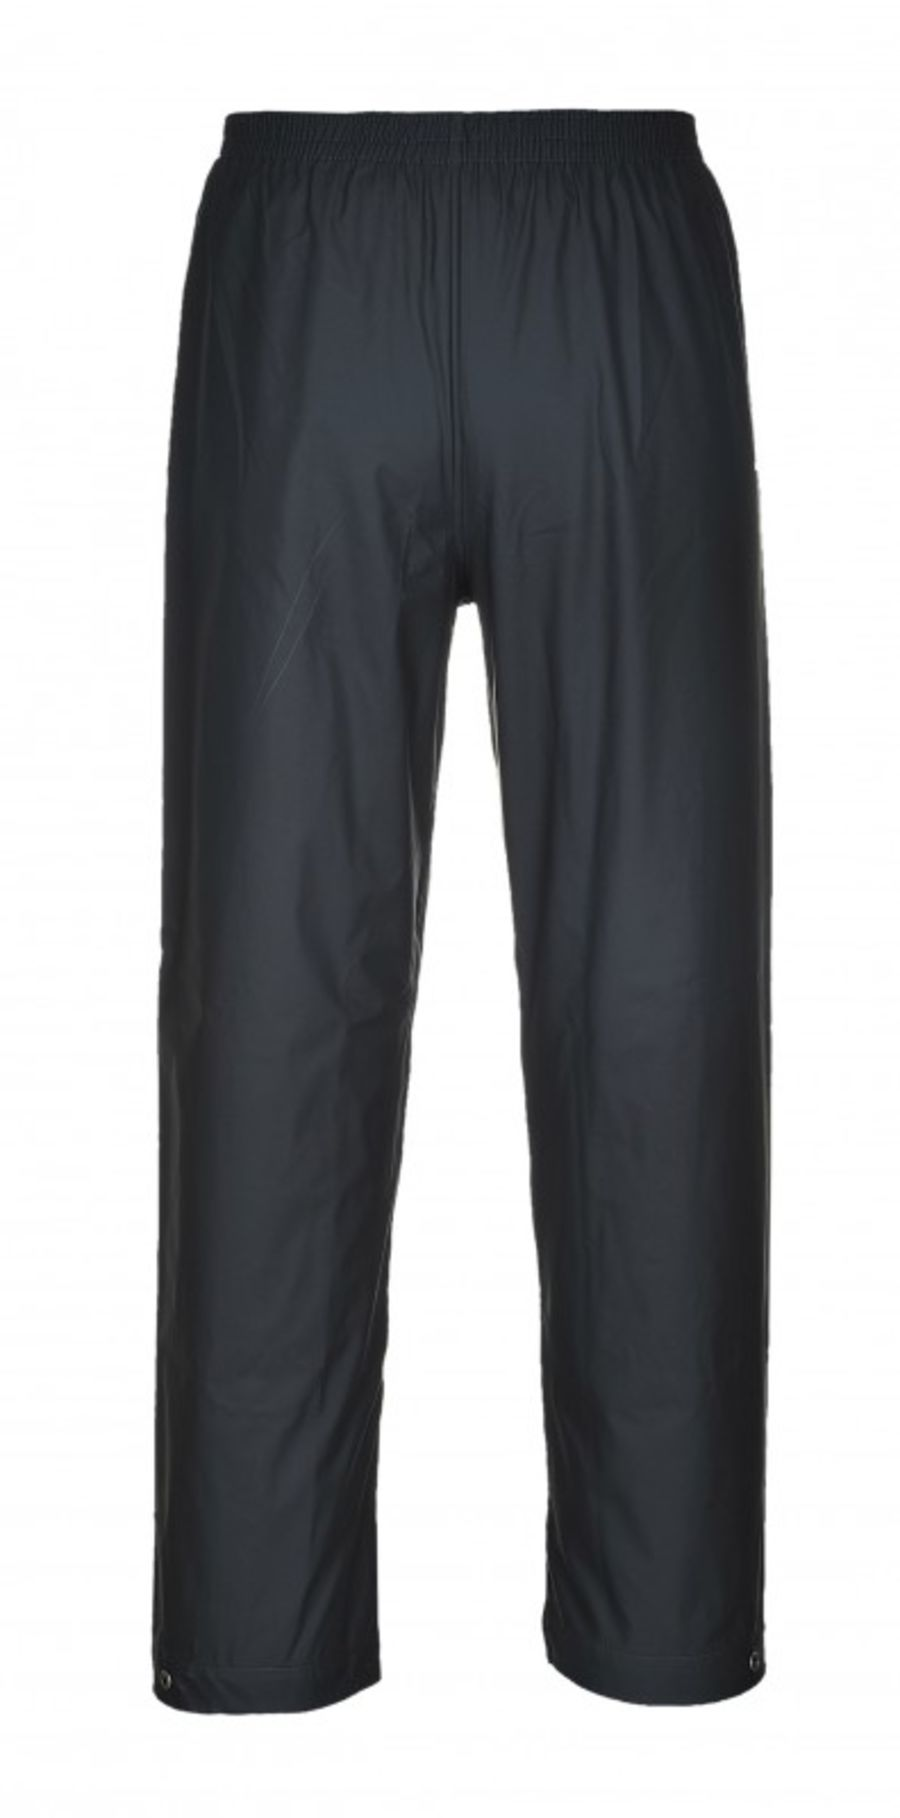 Portwest Sealtex Trousers